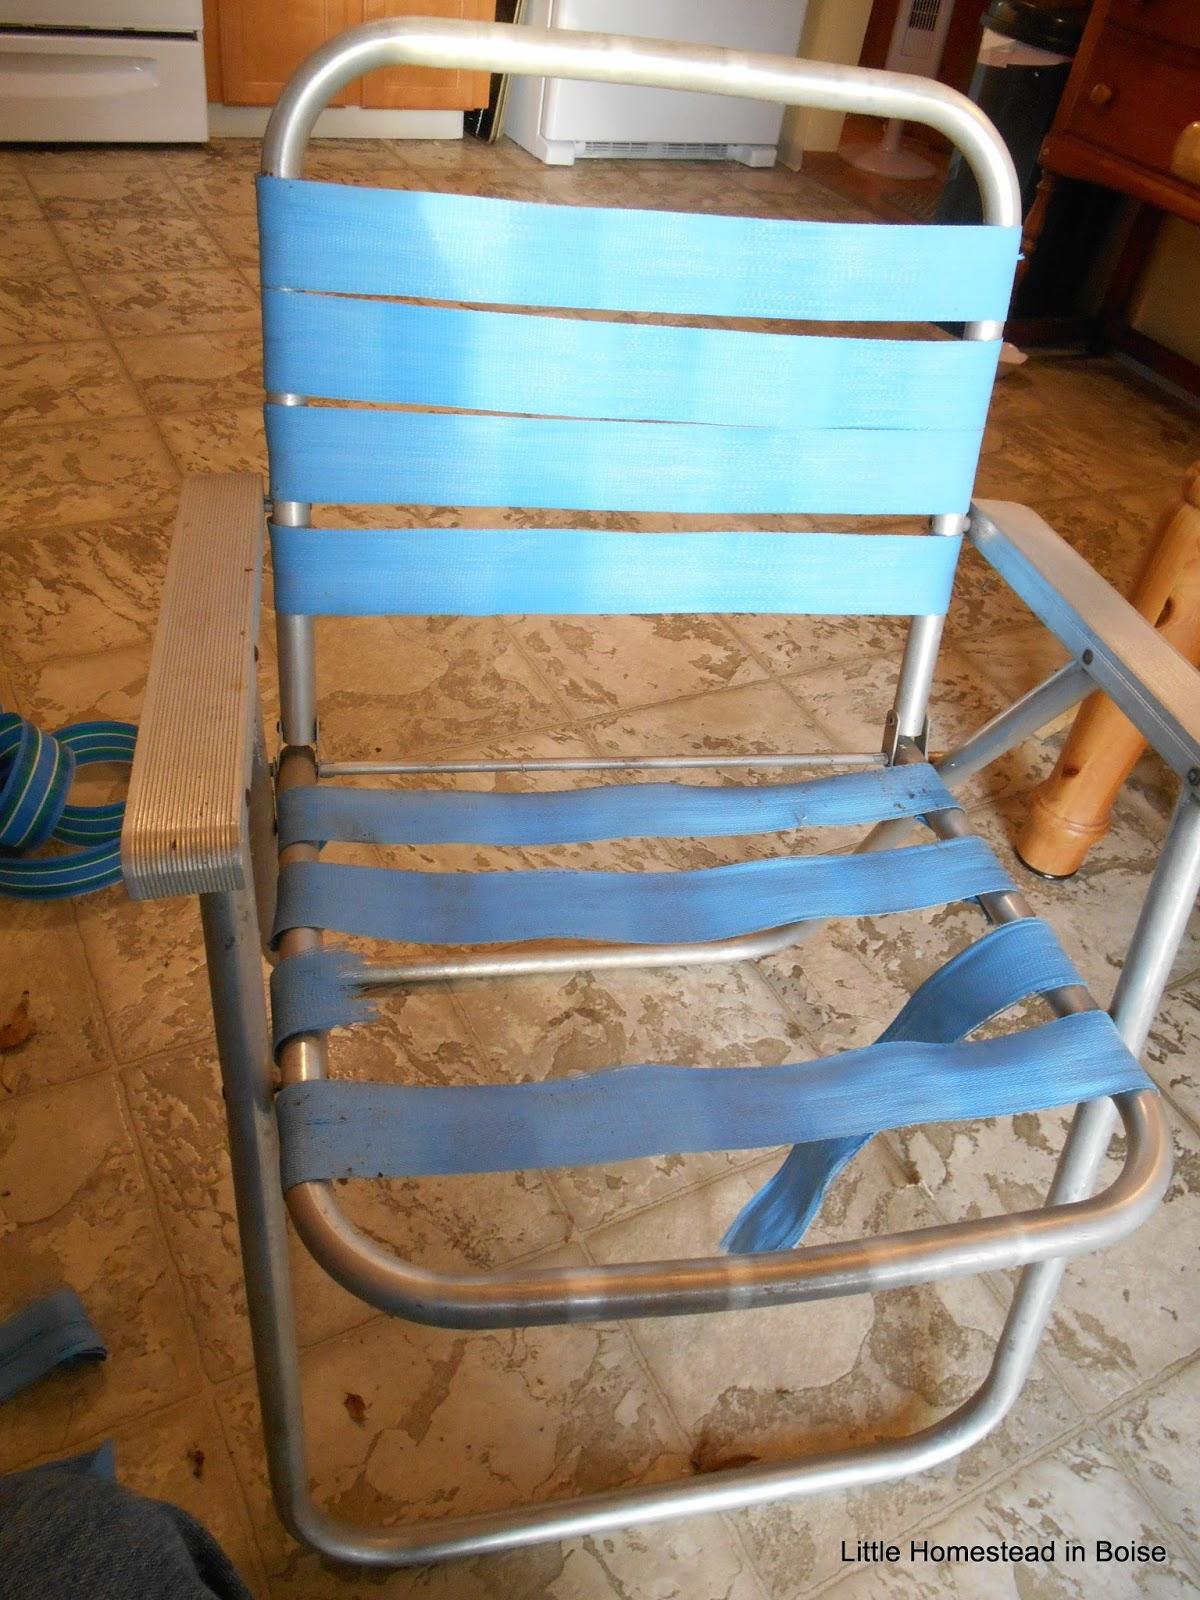 Little homestead in boise re webbing a vintage lawn chair for Lawn chair webbing